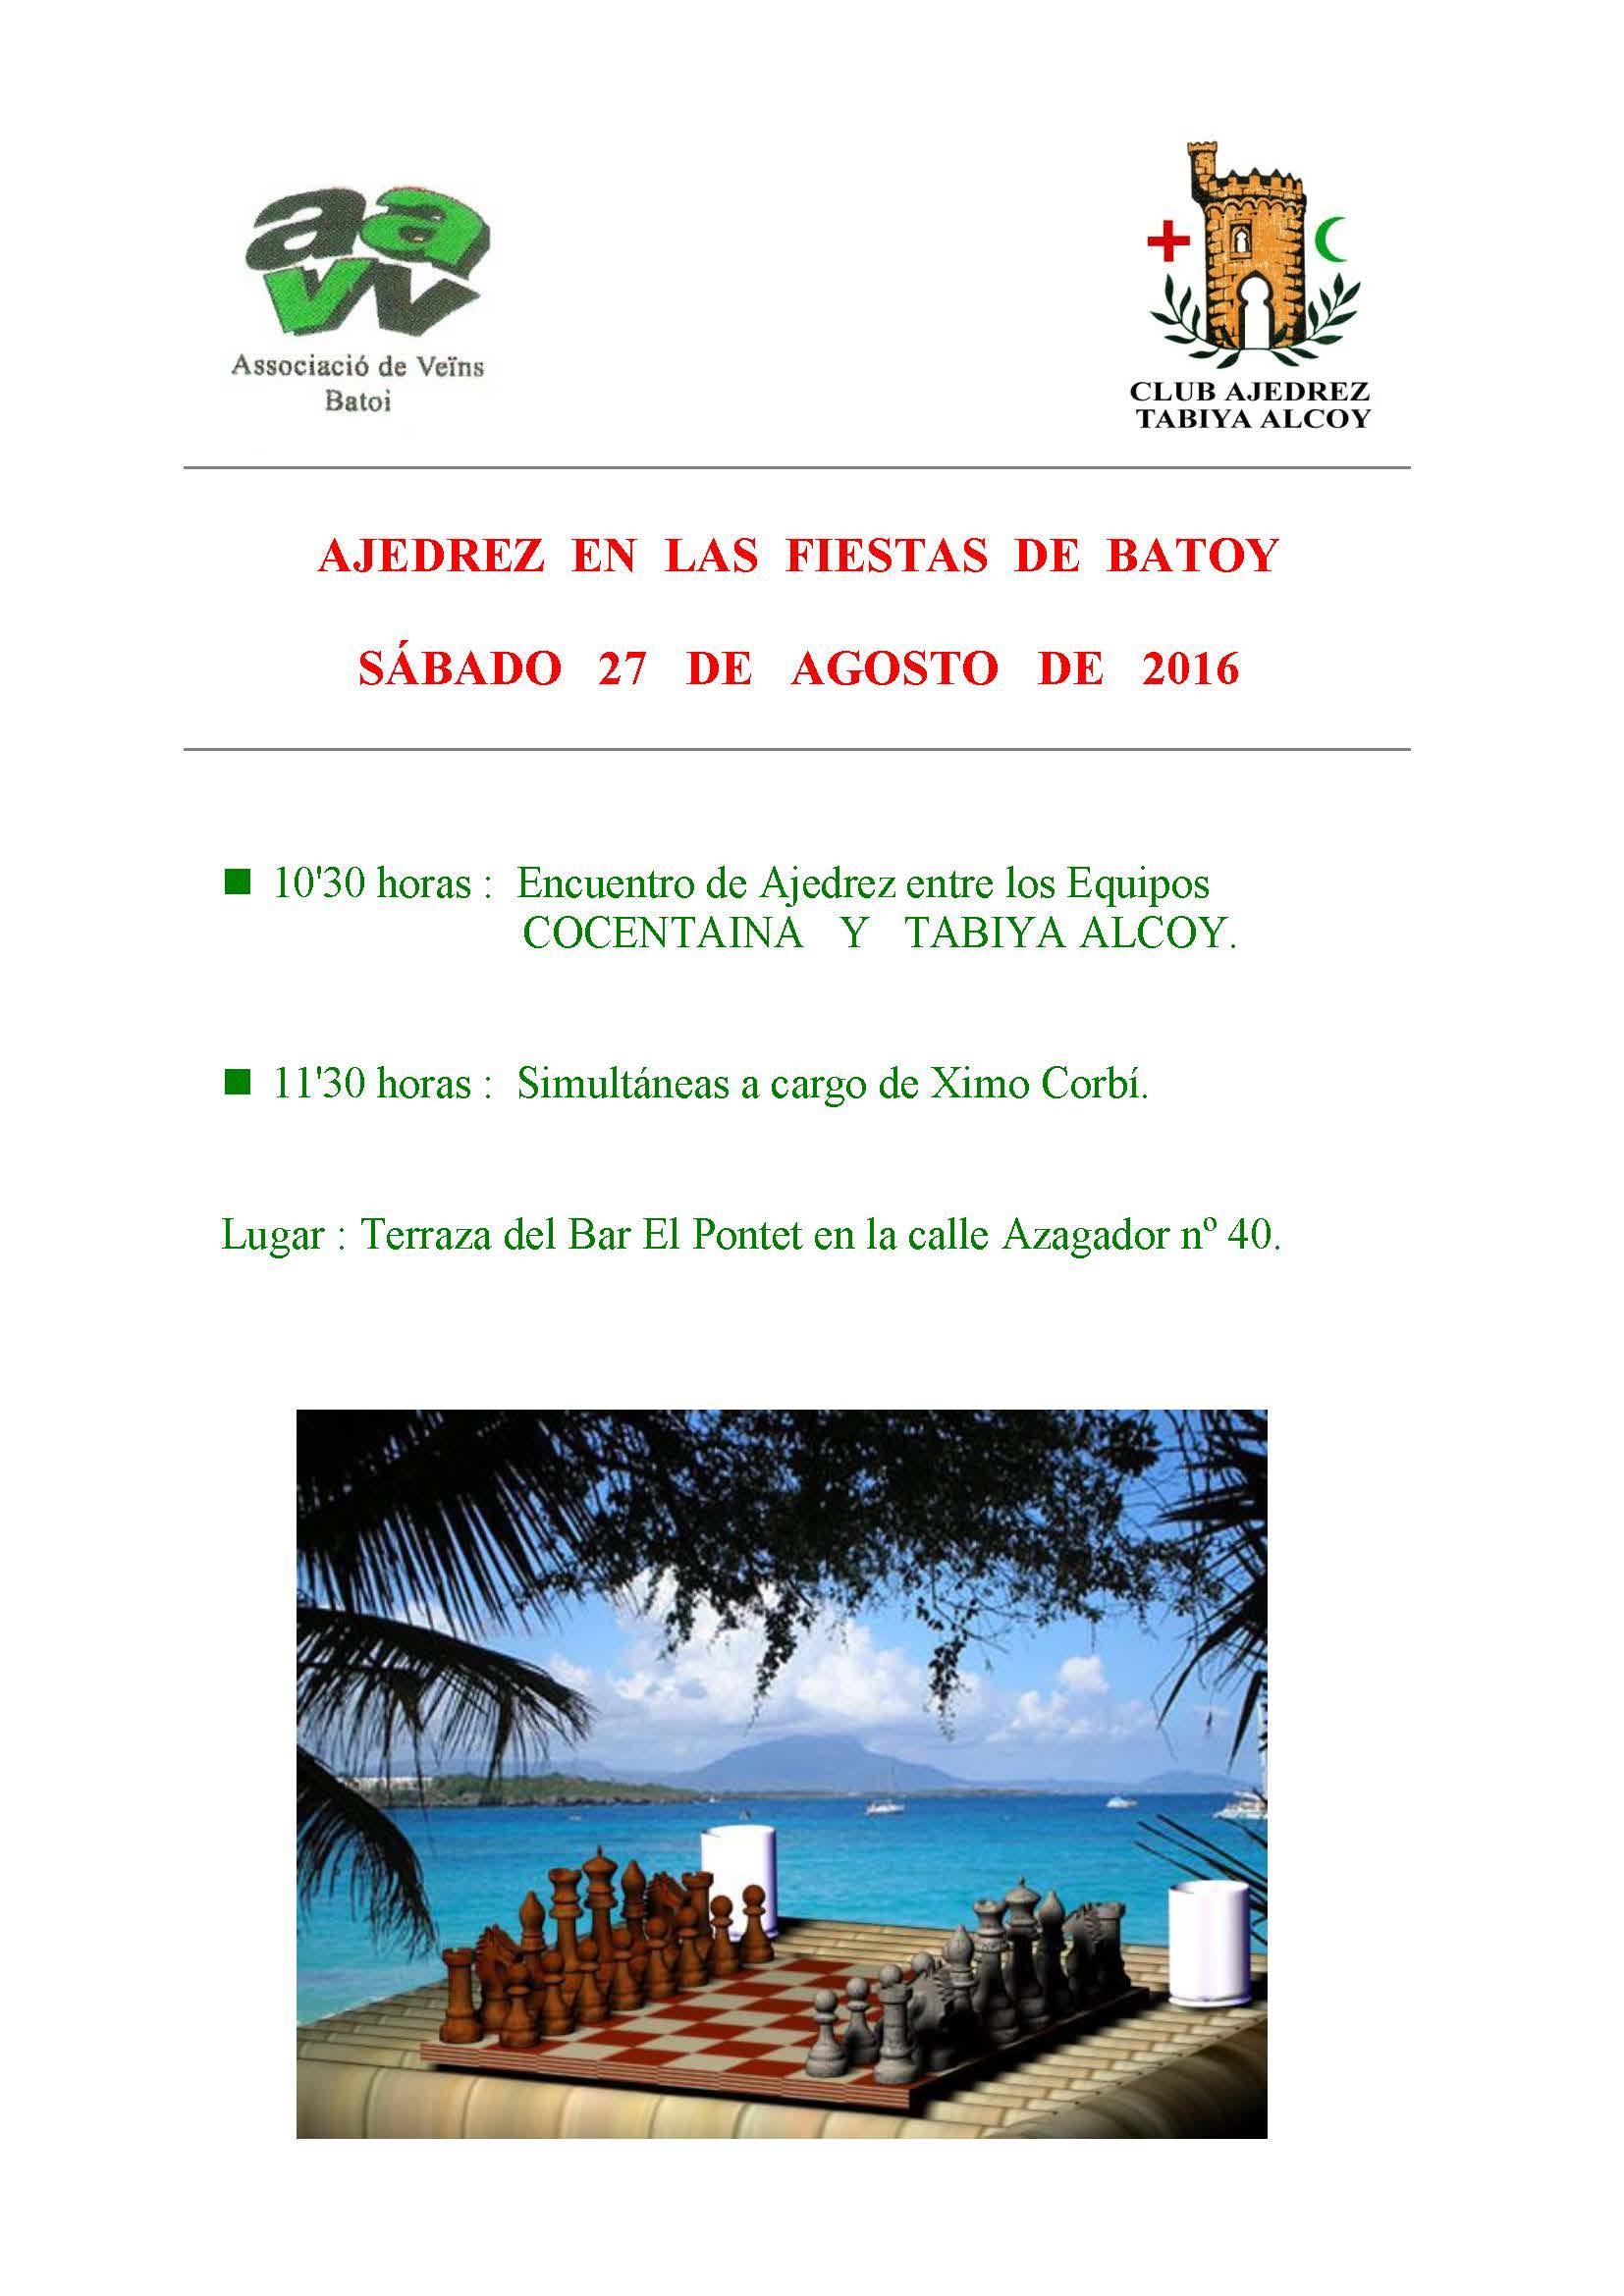 AJEDREZ EN LAS FIESTAS DE BATOY 2016